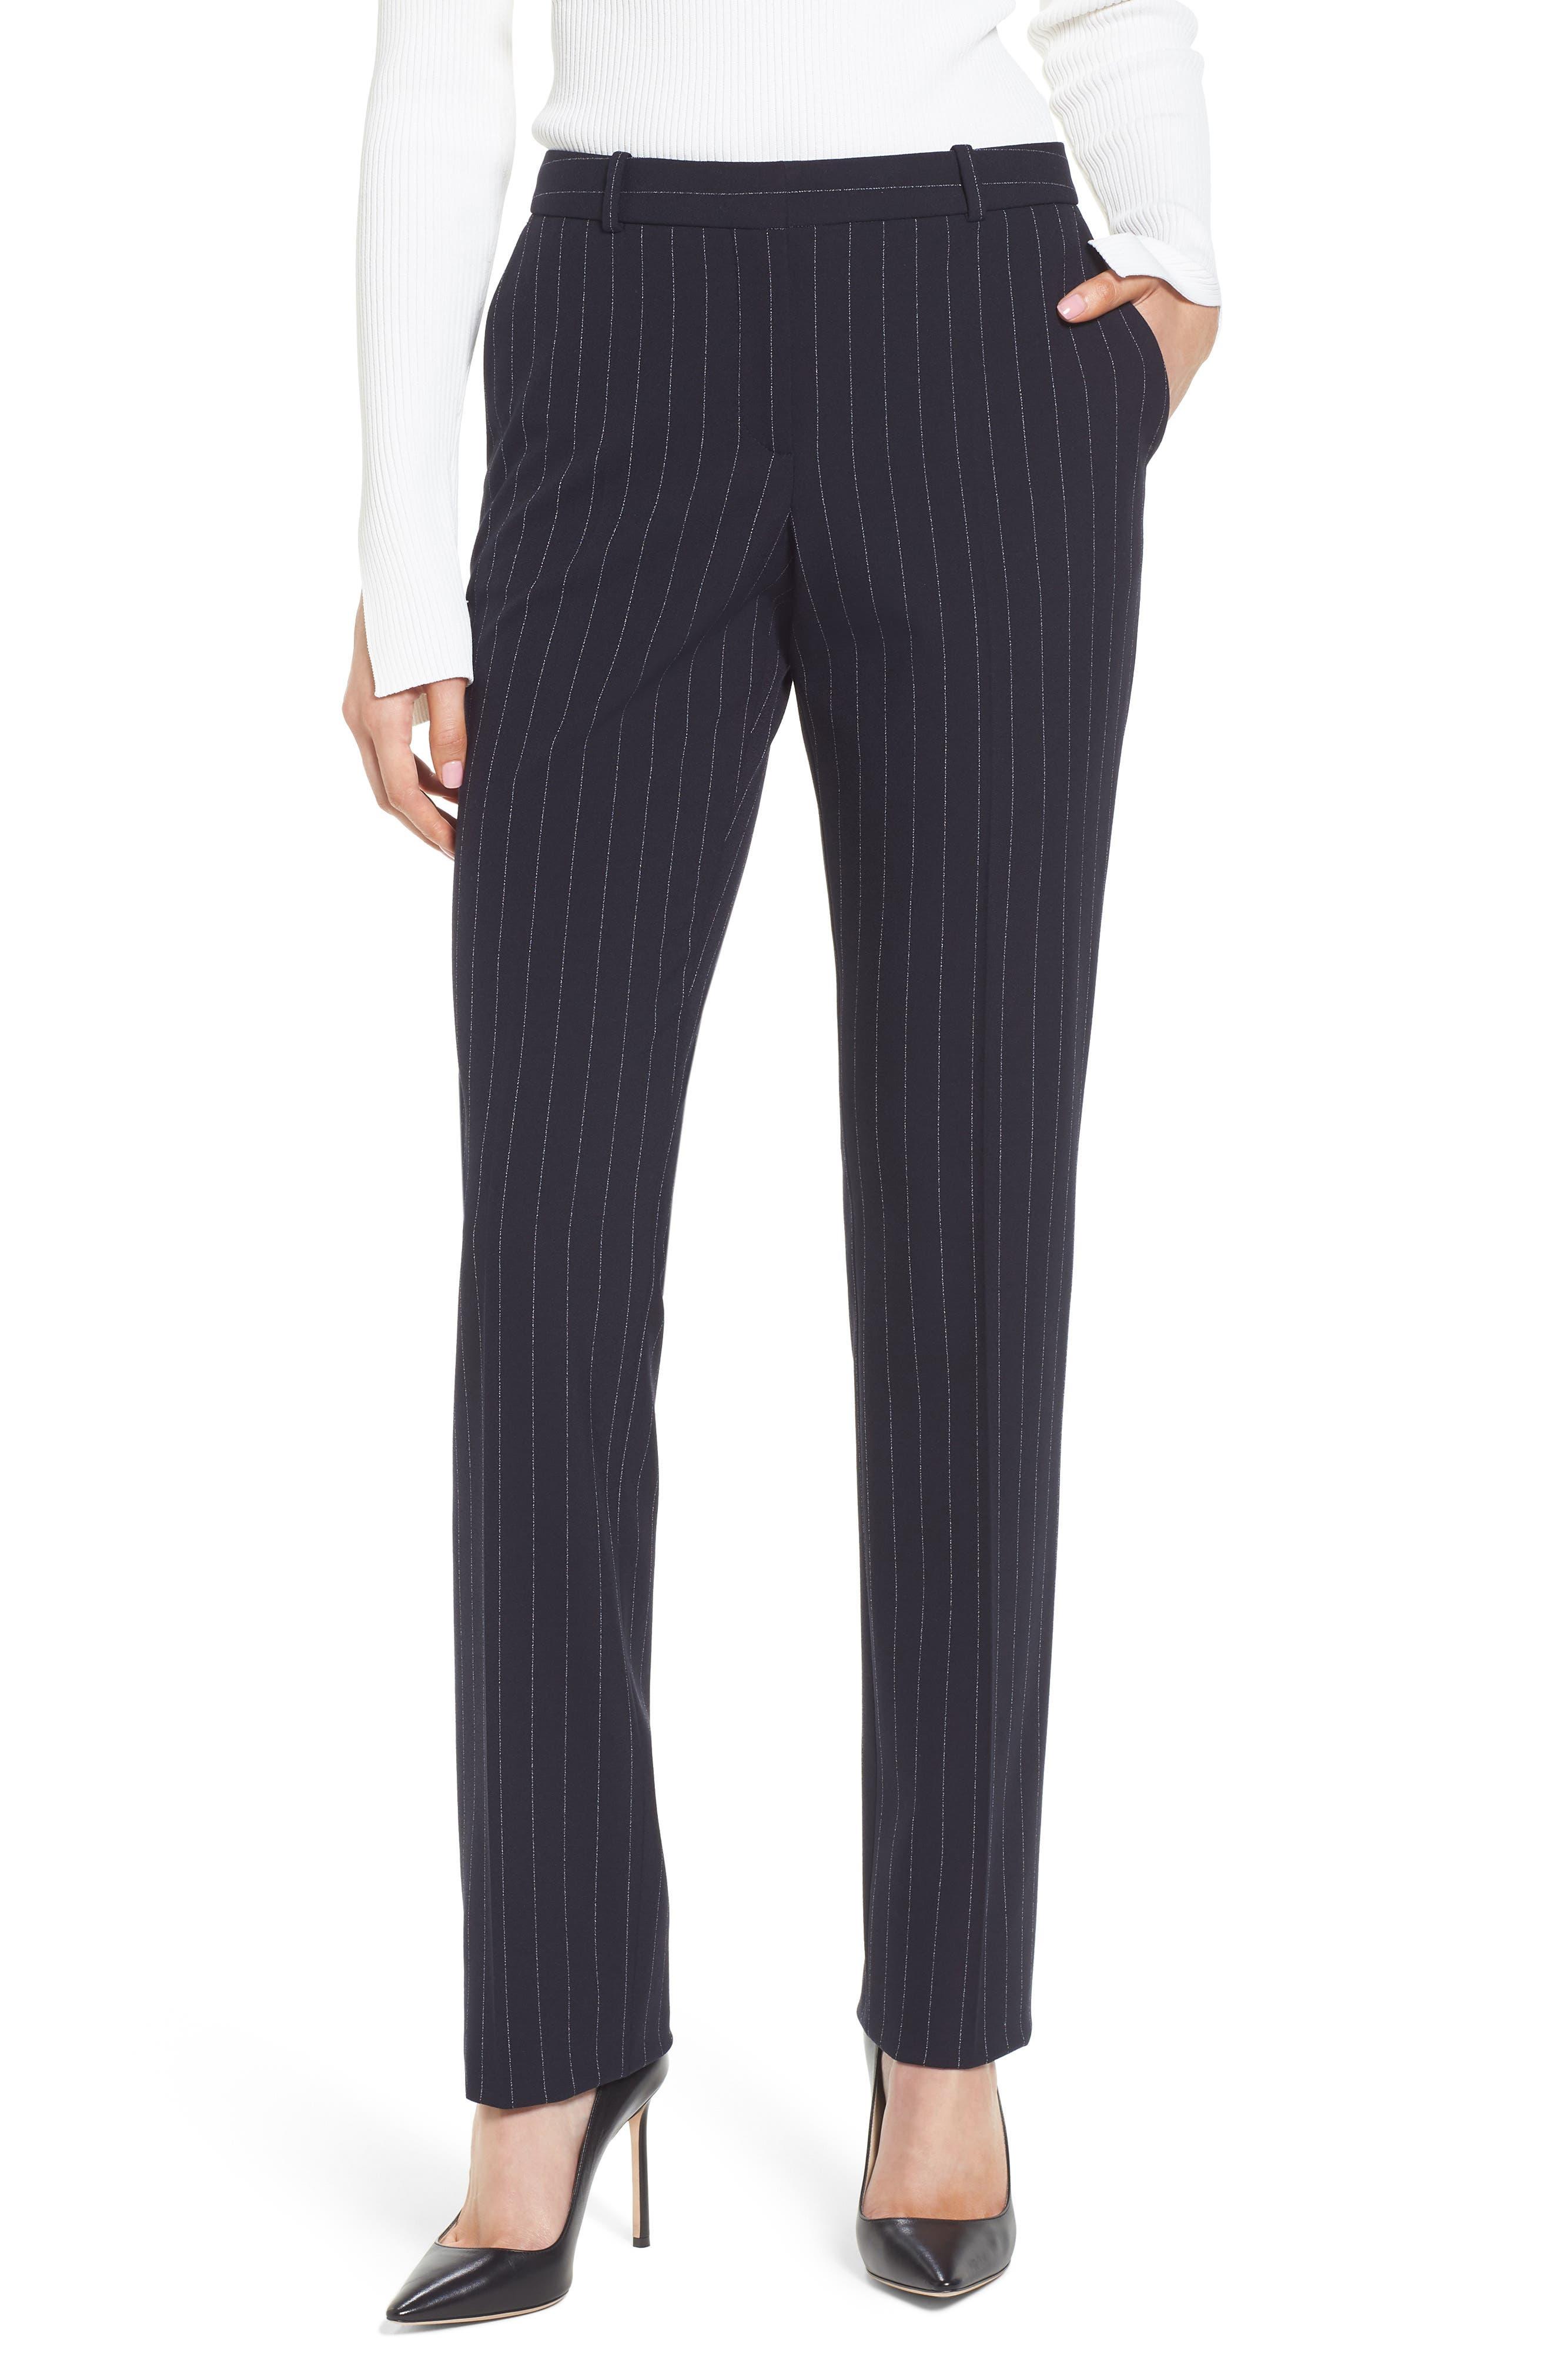 Titana Pinstripe Suit Trousers,                         Main,                         color, Navy Fantasy